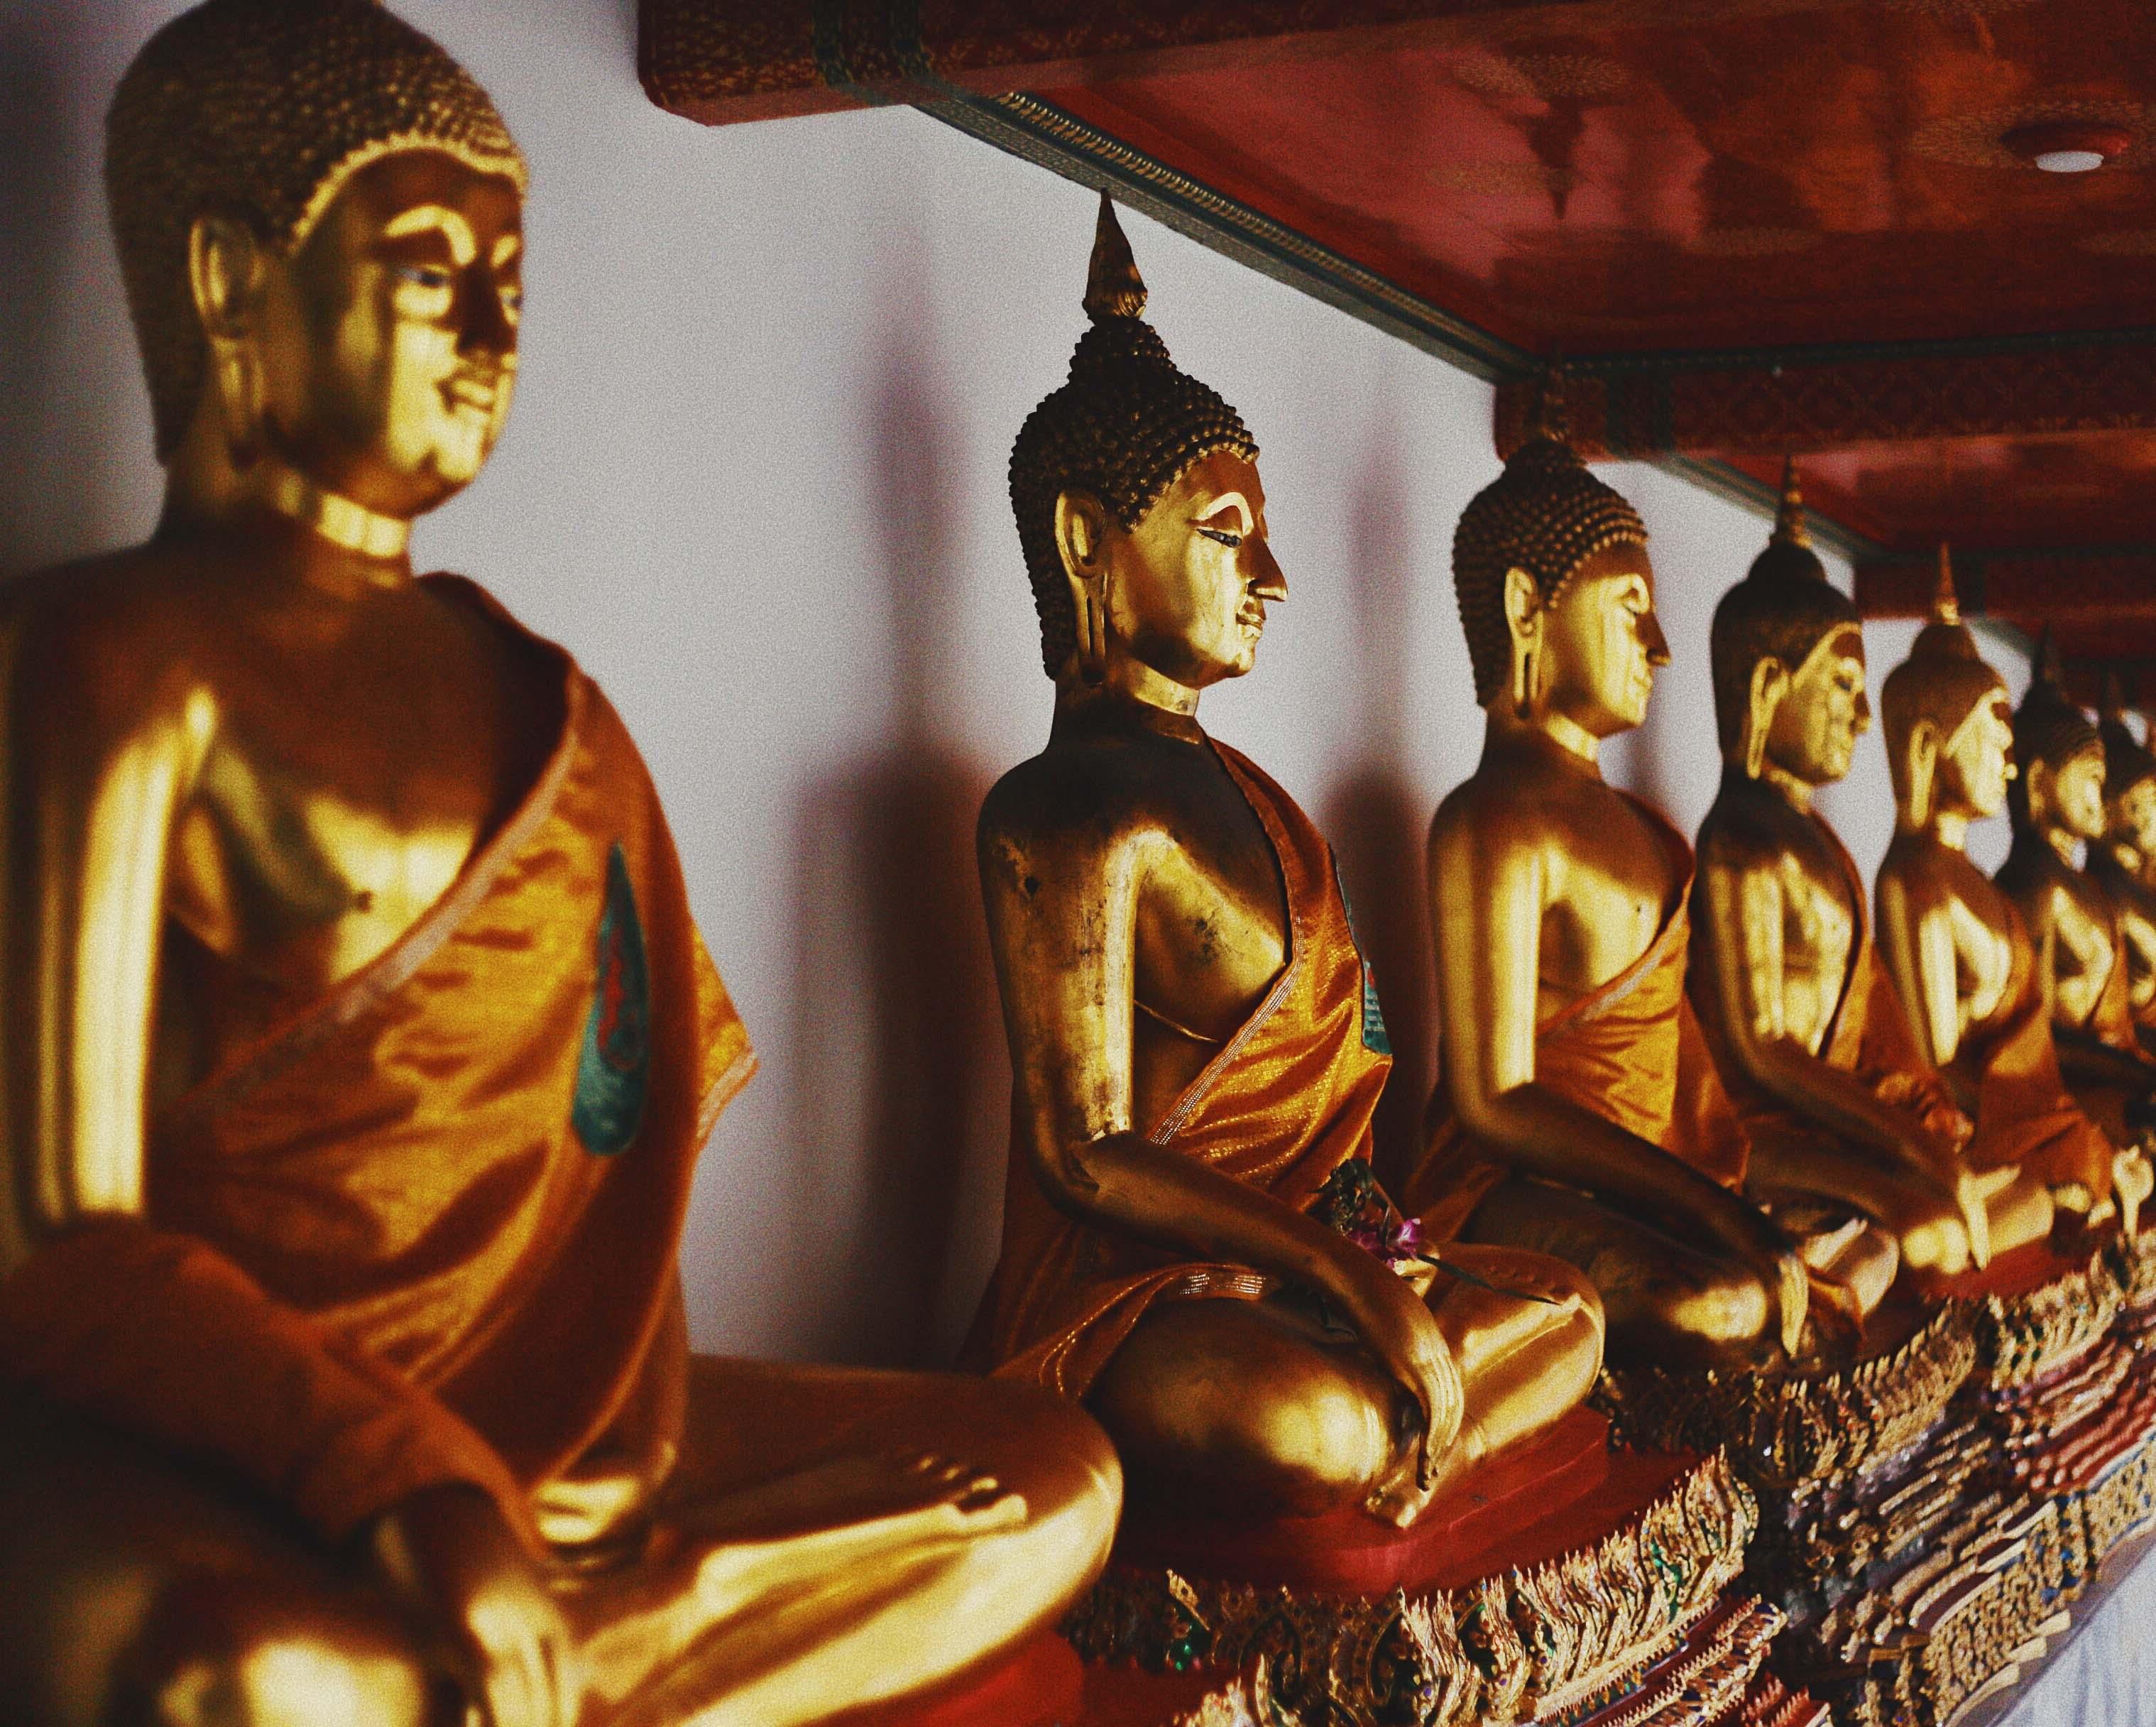 Viaja a Tailandia en grupo con Nomadizers esta Semana Santa